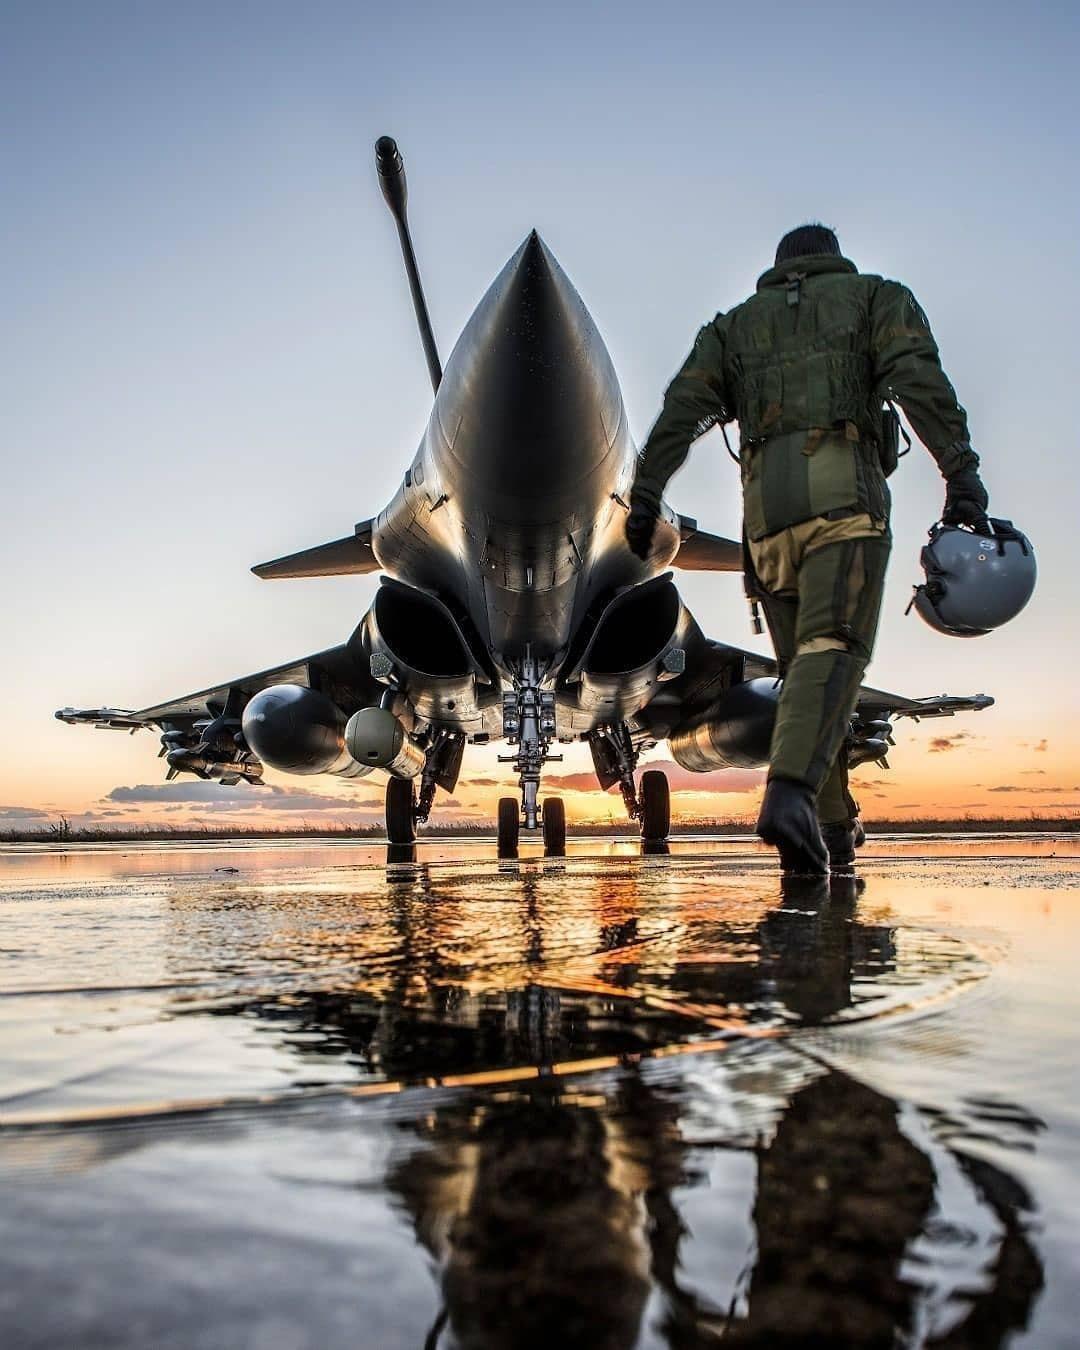 Phantom Phanatic Planesawesome Dassault Rafale Credits Jet Fighter Pilot Air Fighter Fighter Planes Jets